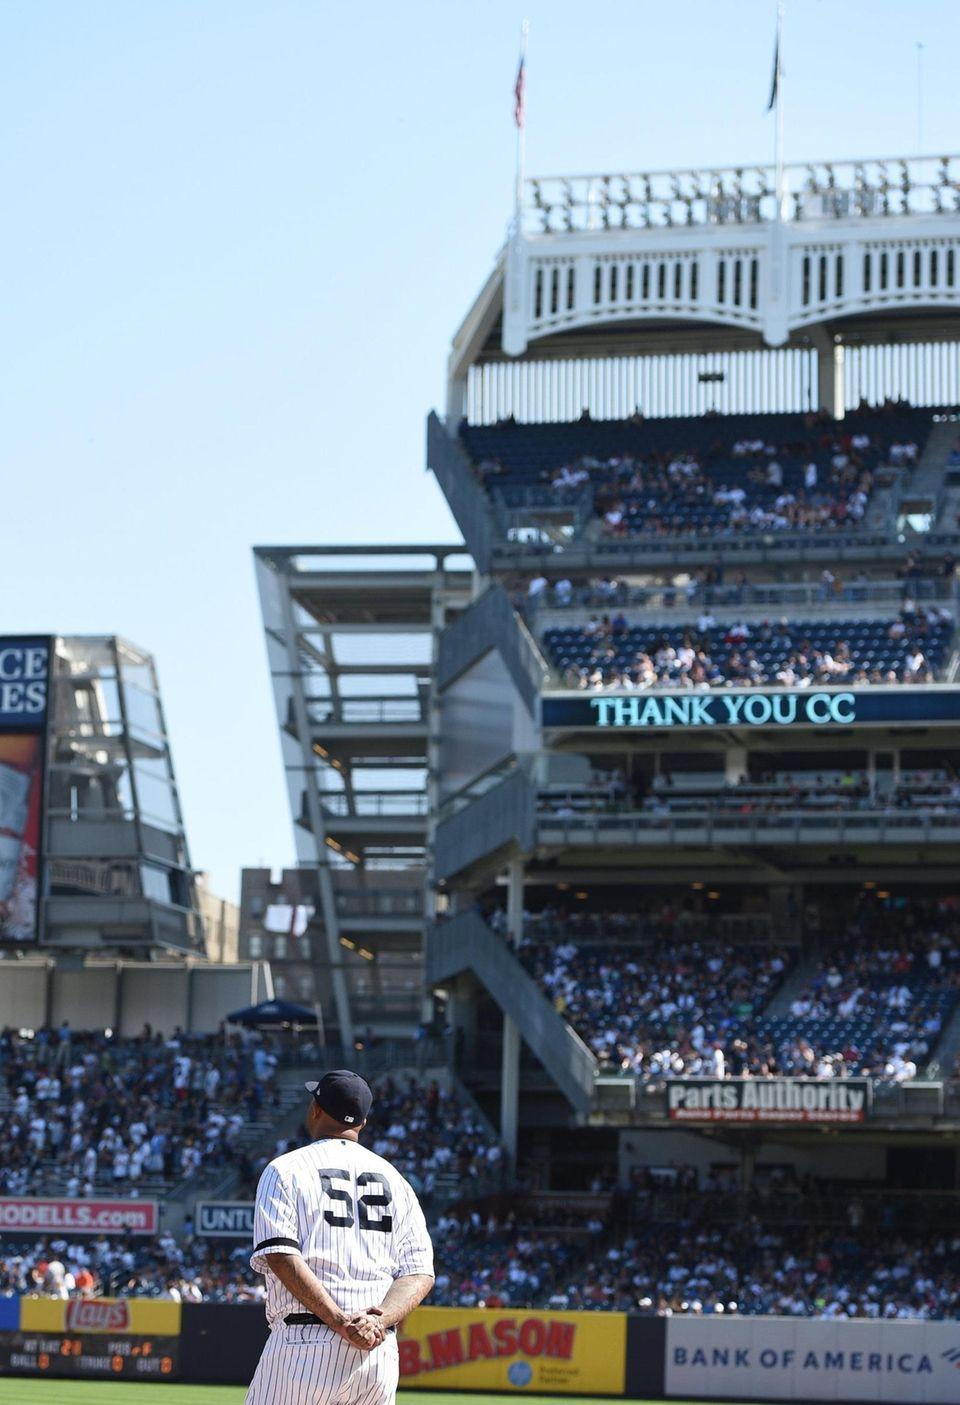 New York Yankees pitcher CC Sabathia watches as